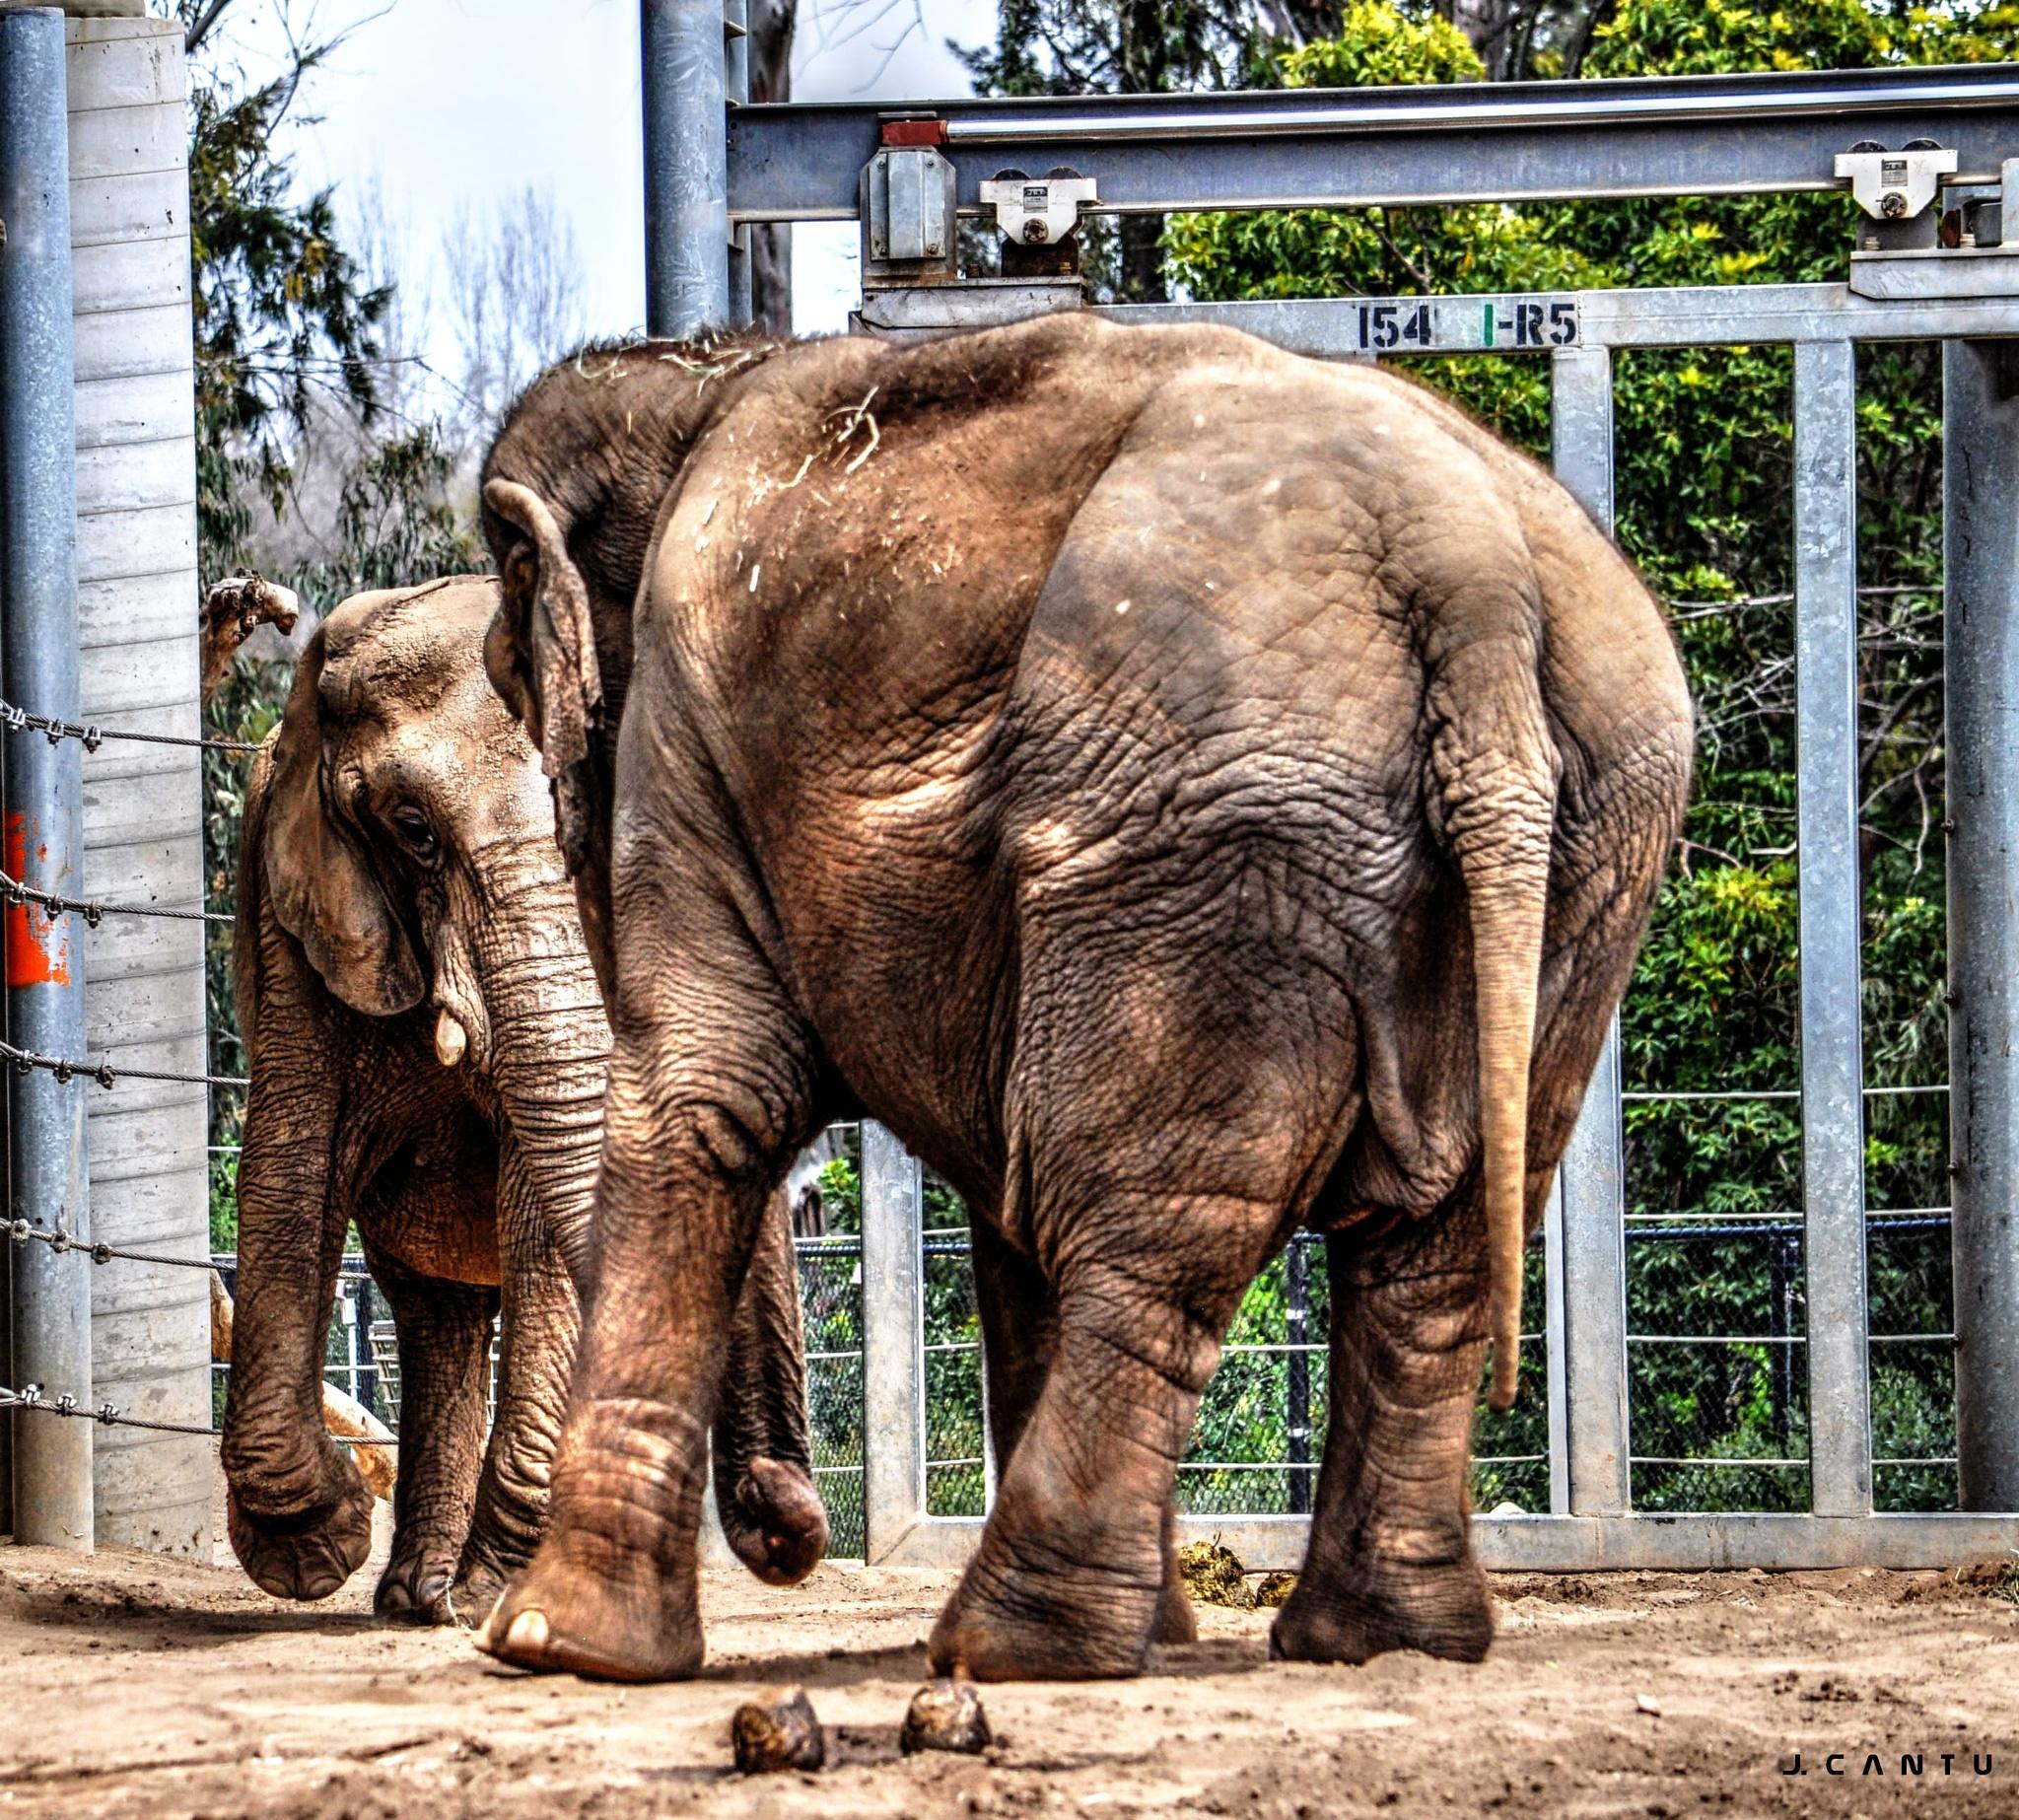 2 Elephant's Walk Into A bar..................... by Jaime Cantu